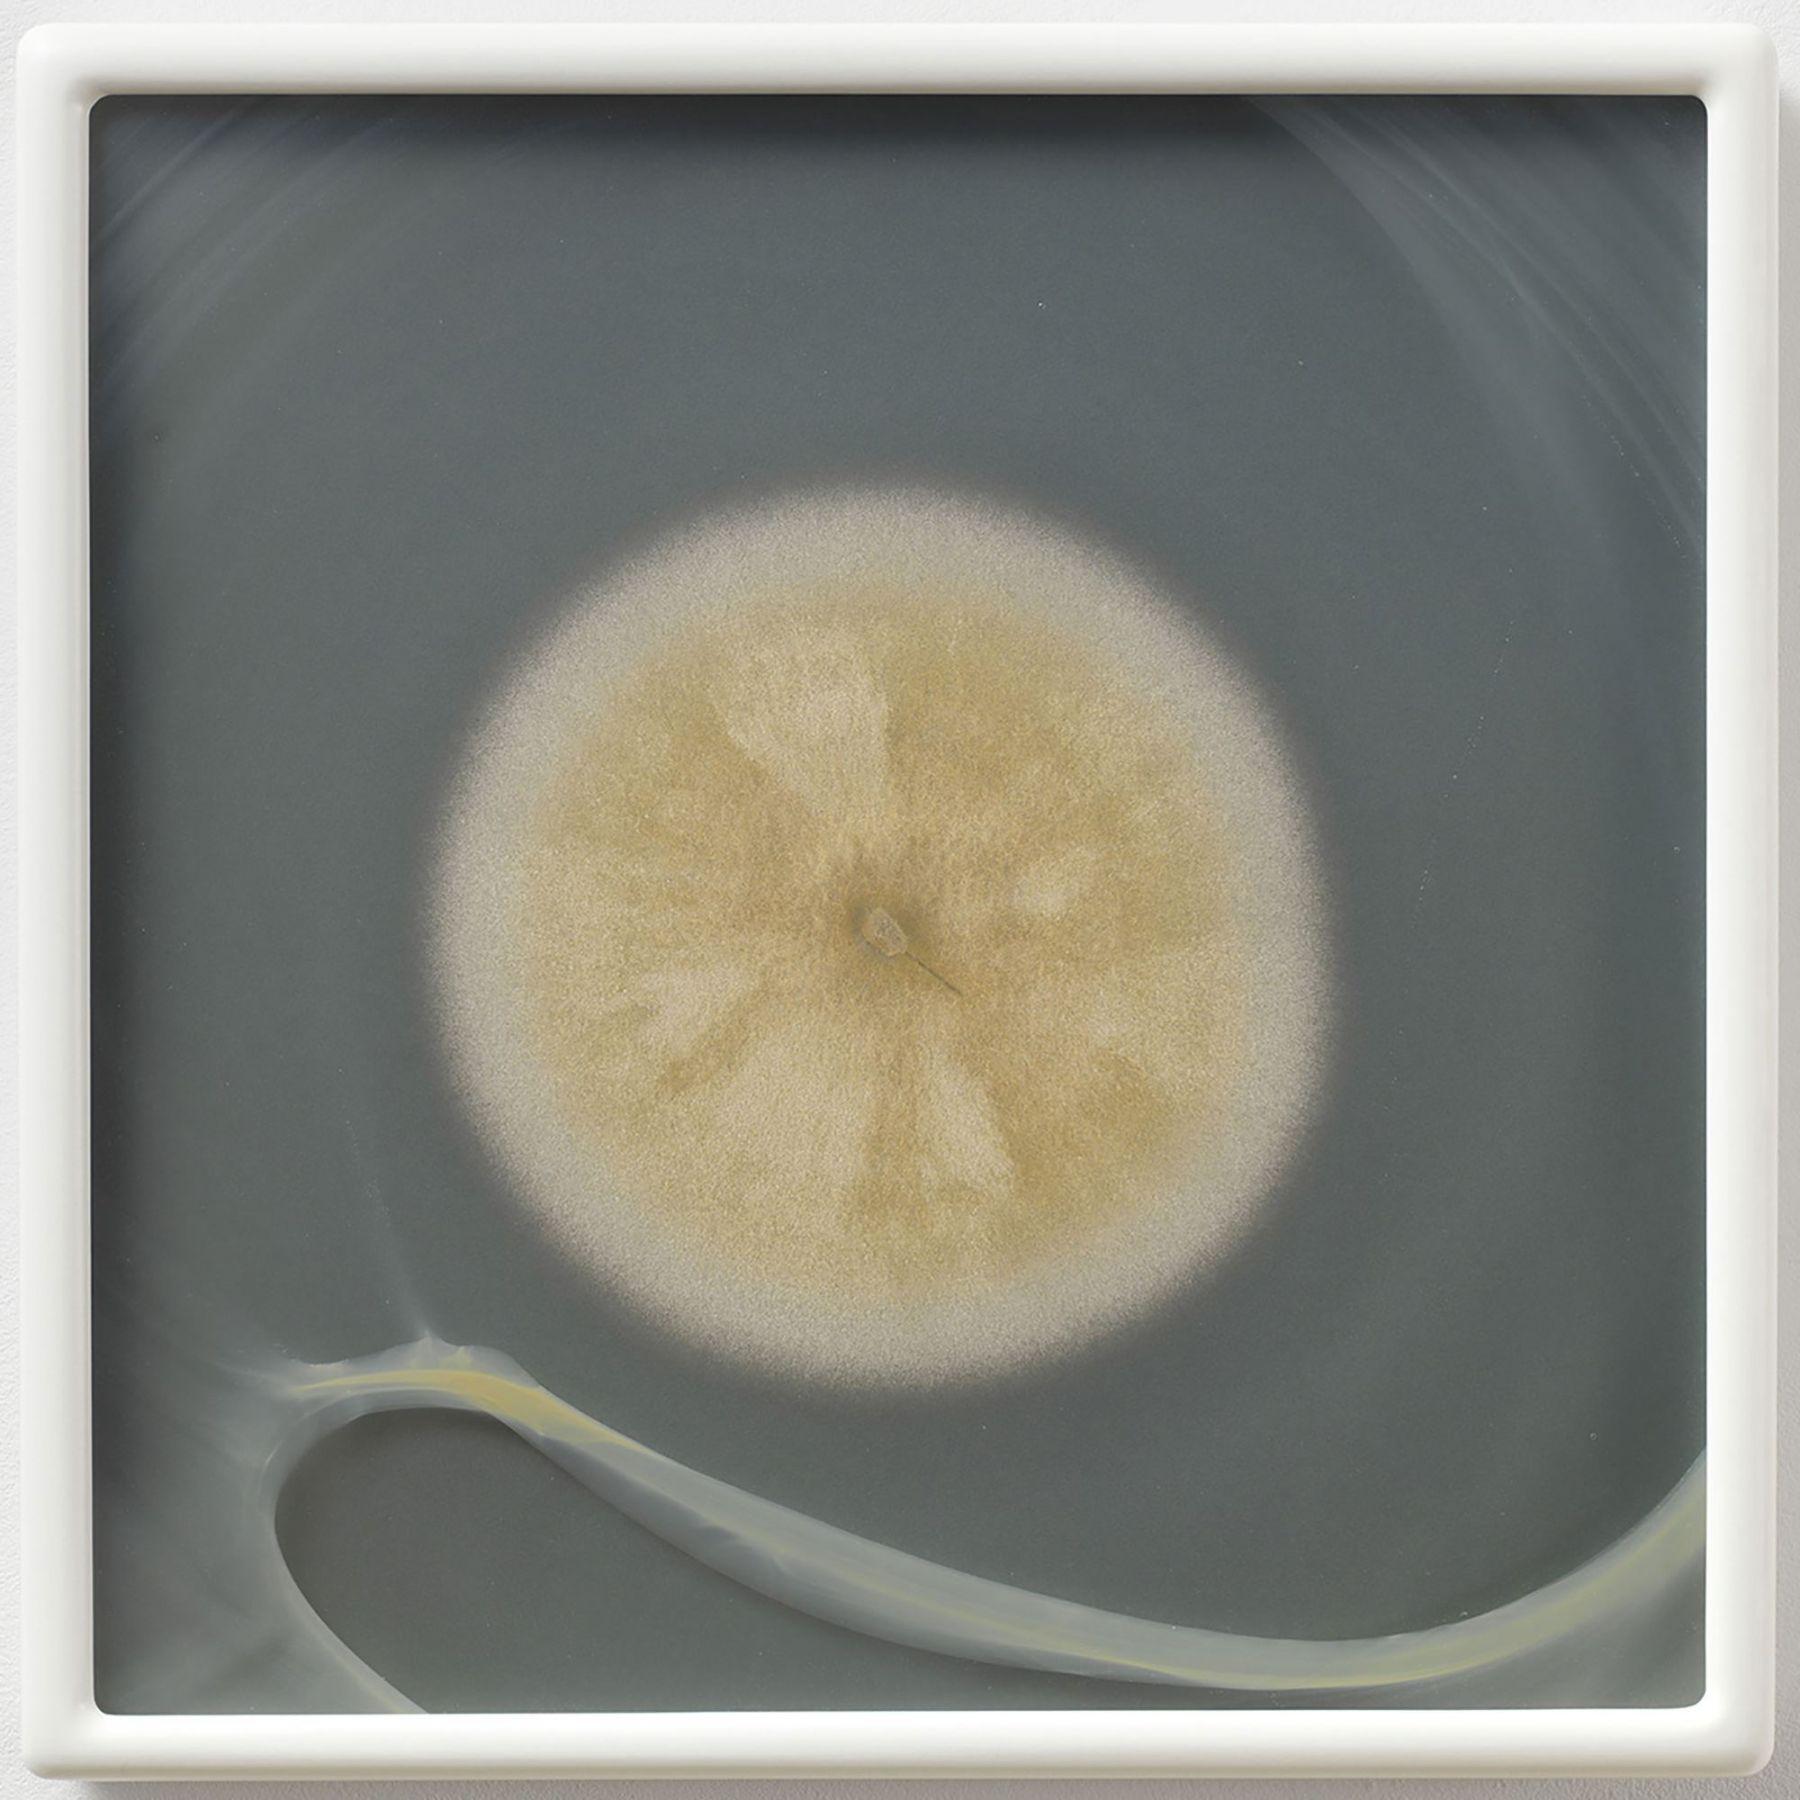 Aspergillus flavus myc 4 (CRCC) CZ #54